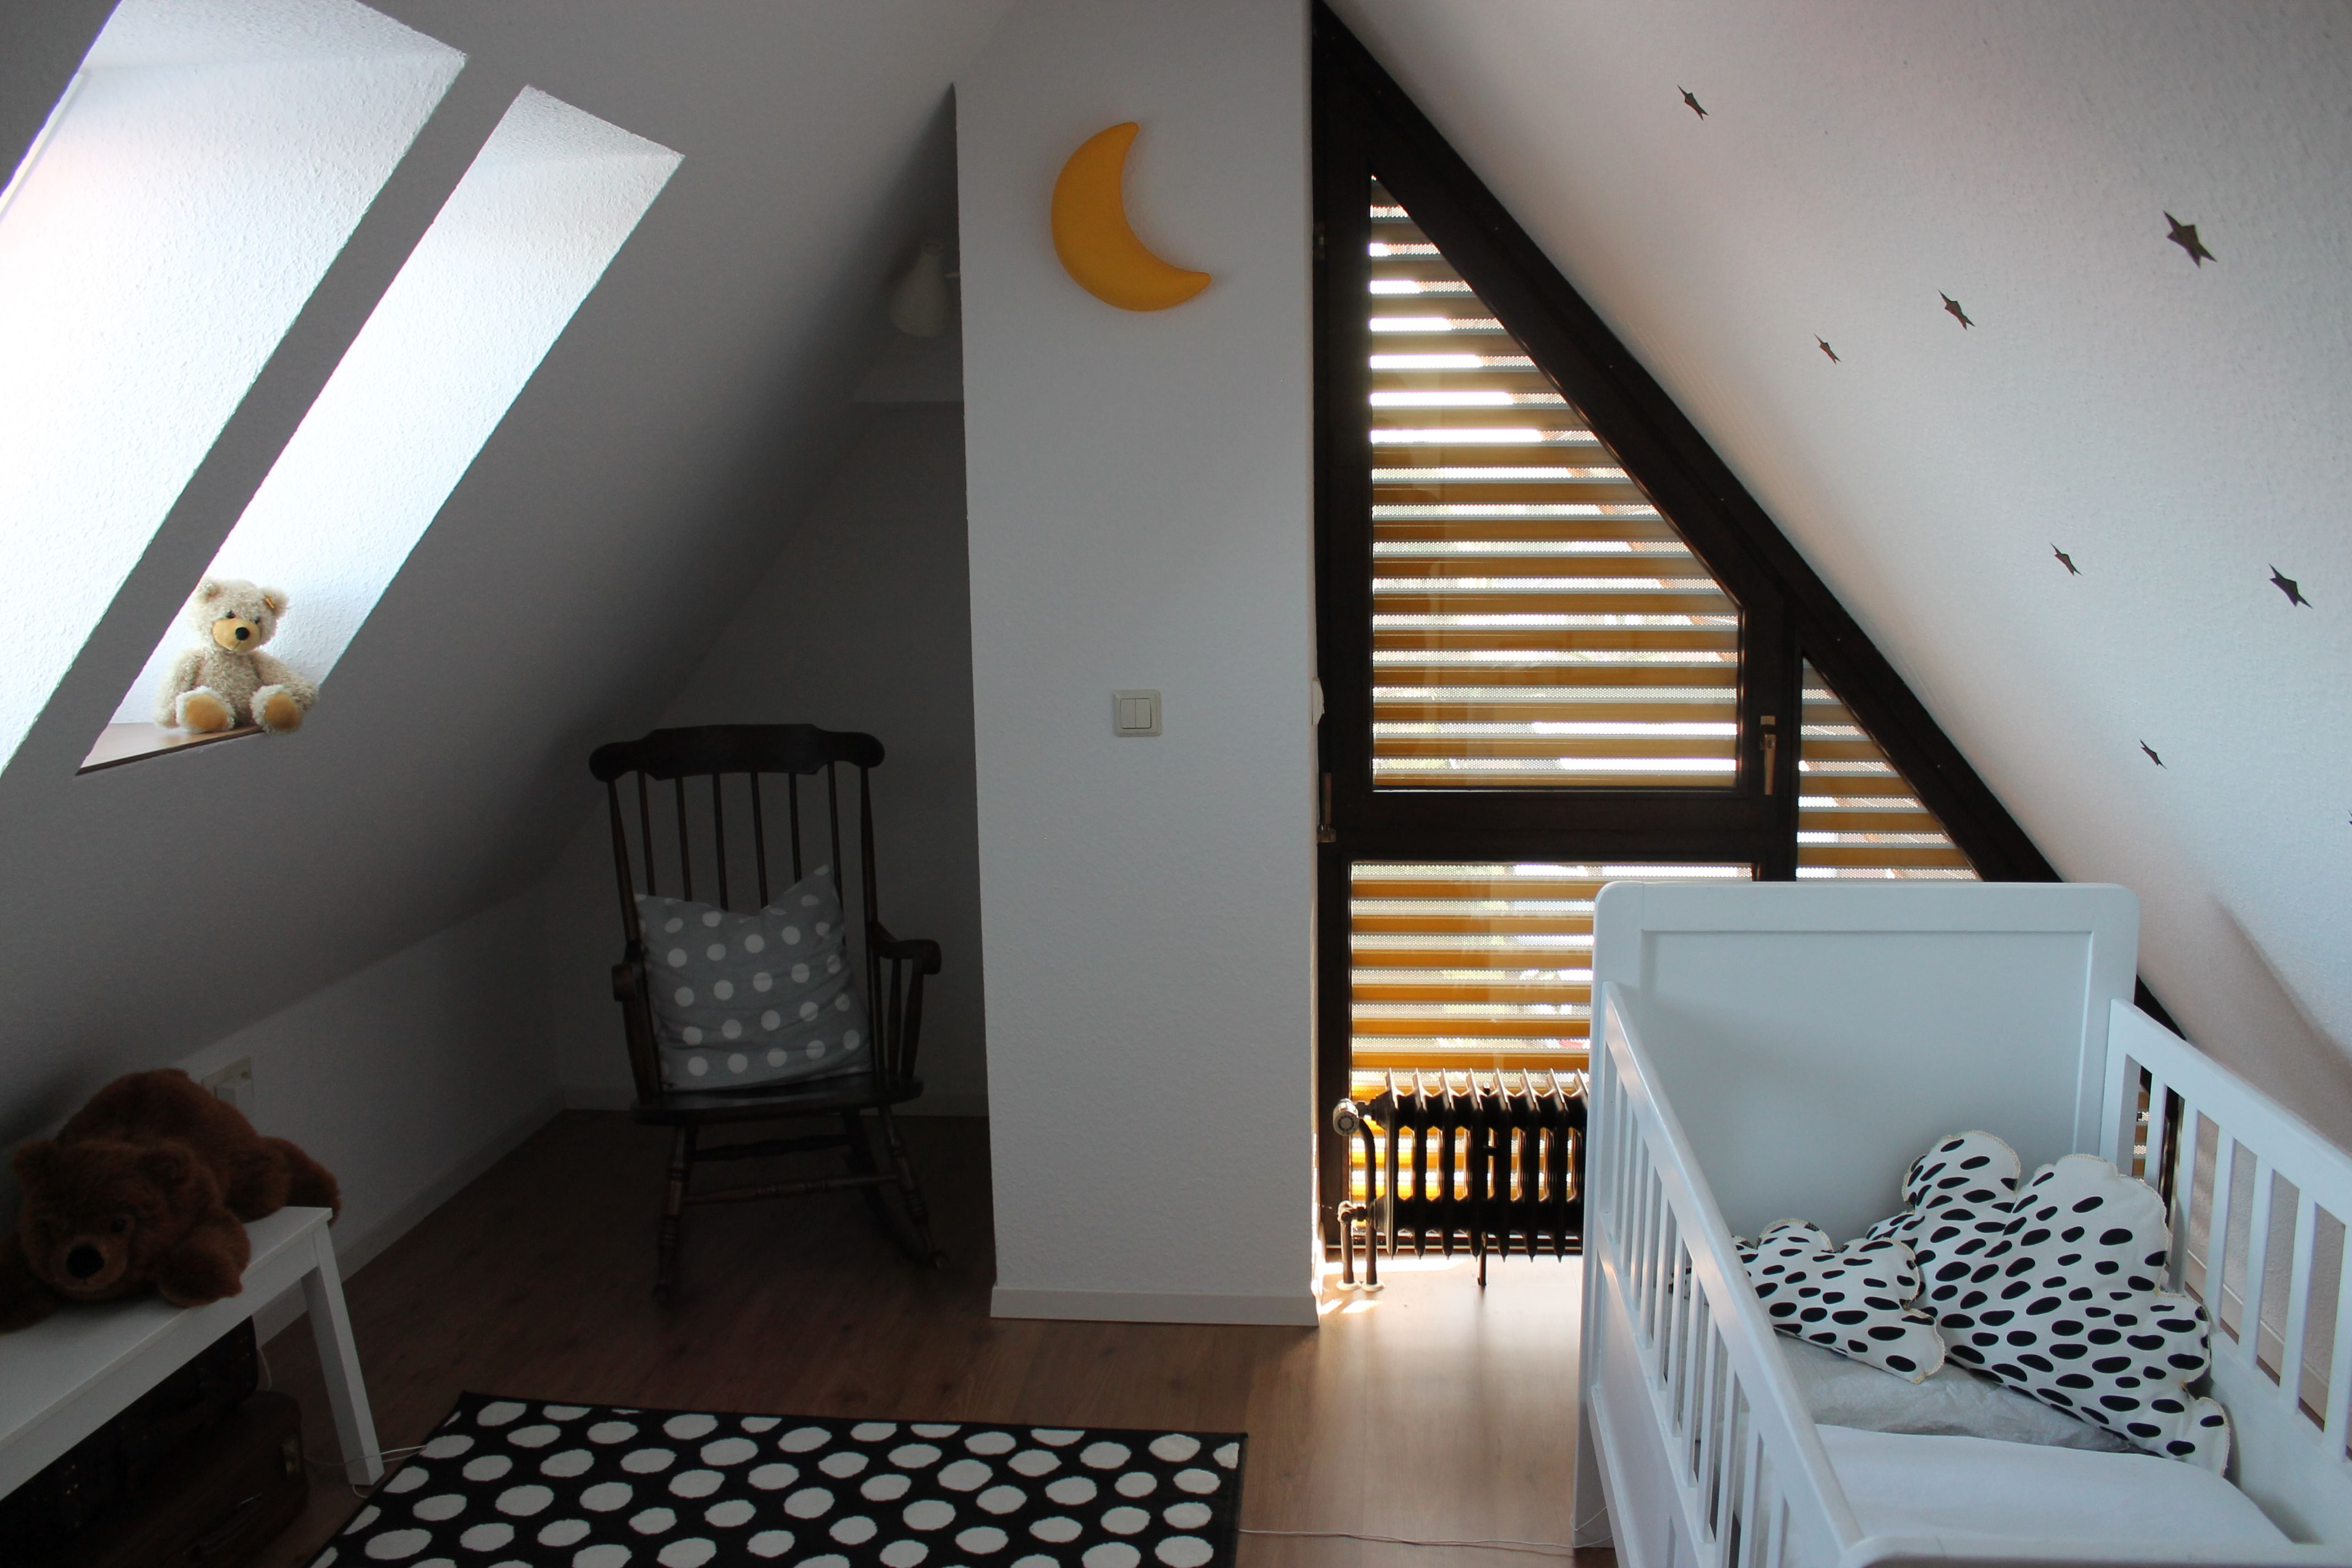 Sleeping room for little boys like a tent precious little souls